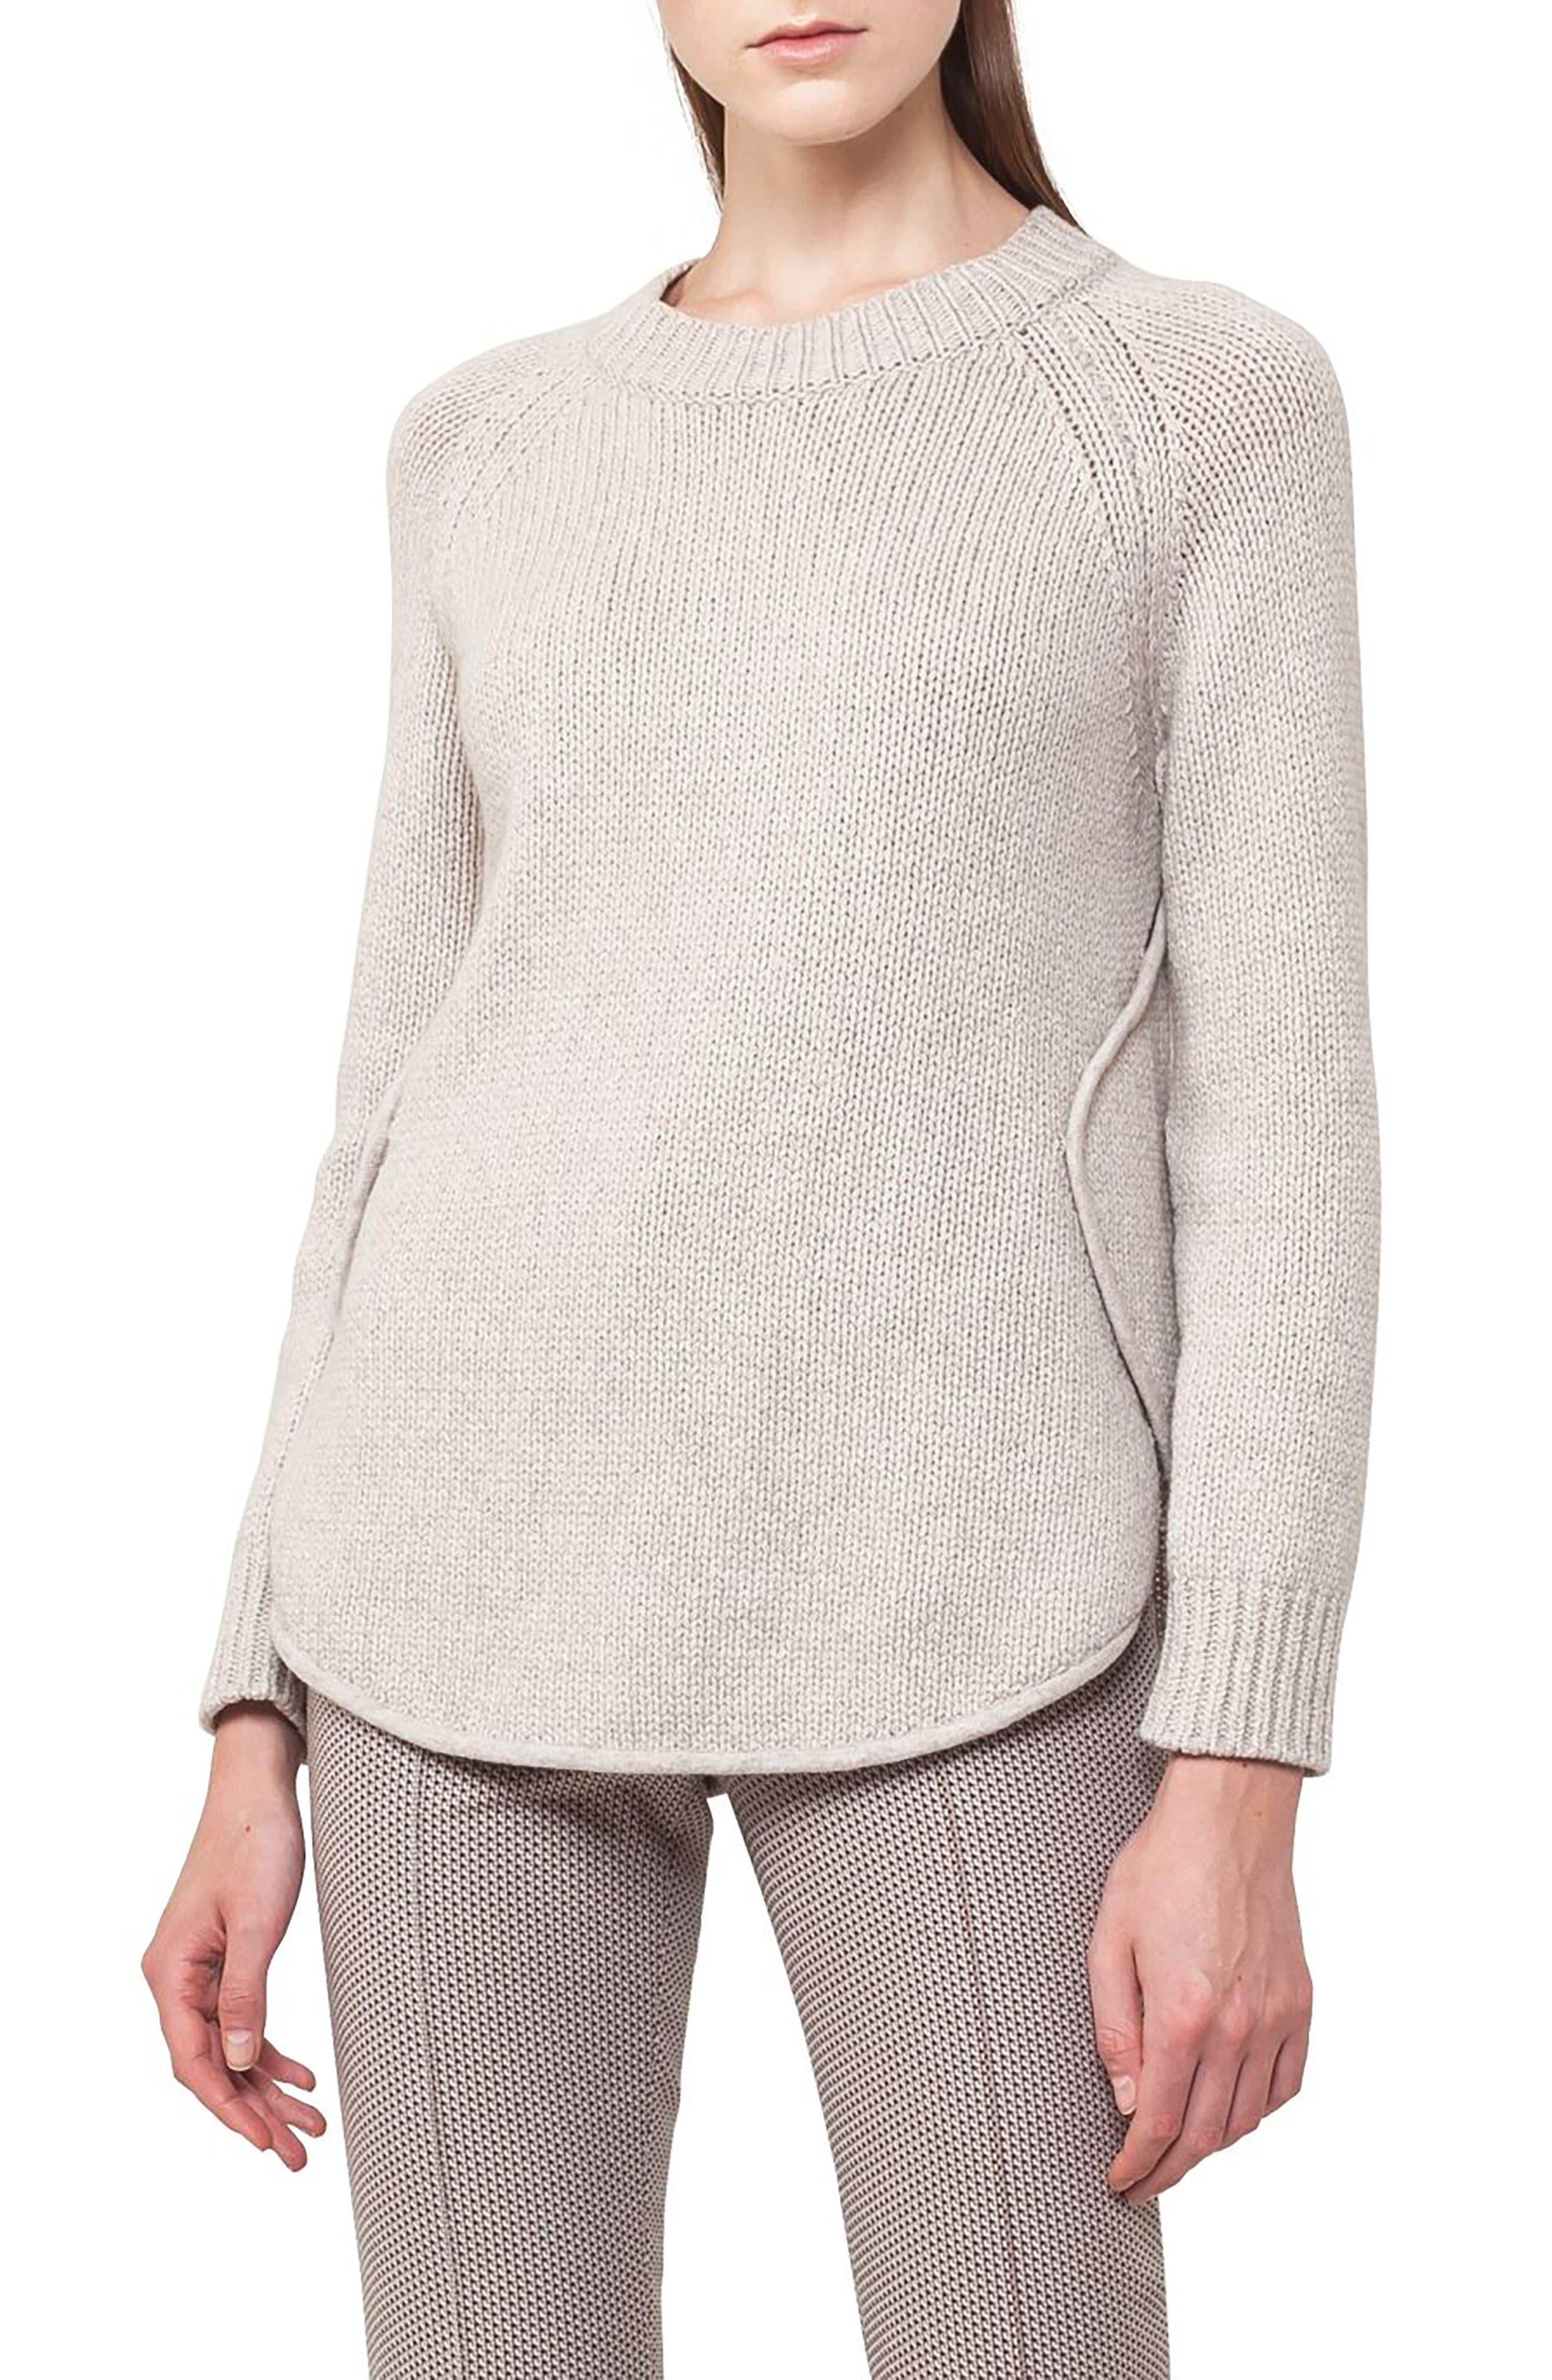 Main Image - Akris punto Quadrant Circle Cashmere Blend Pullover